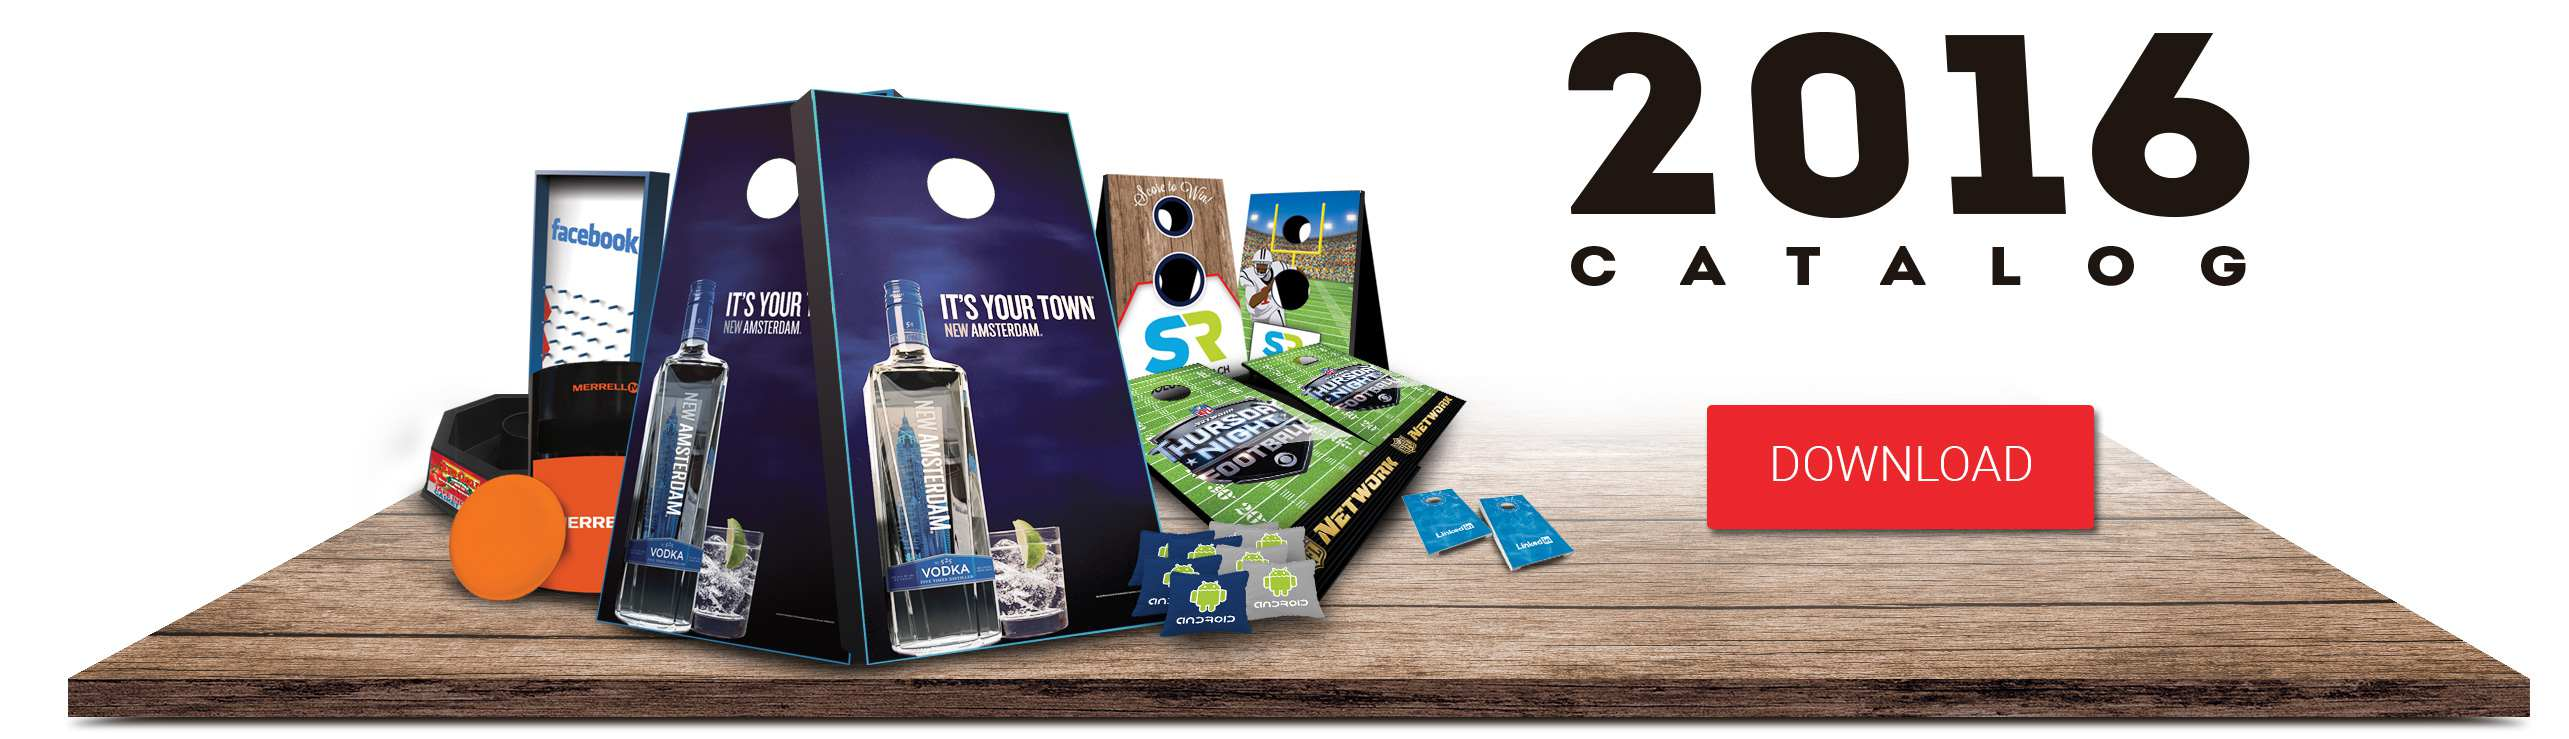 Promotoss branded games catalog